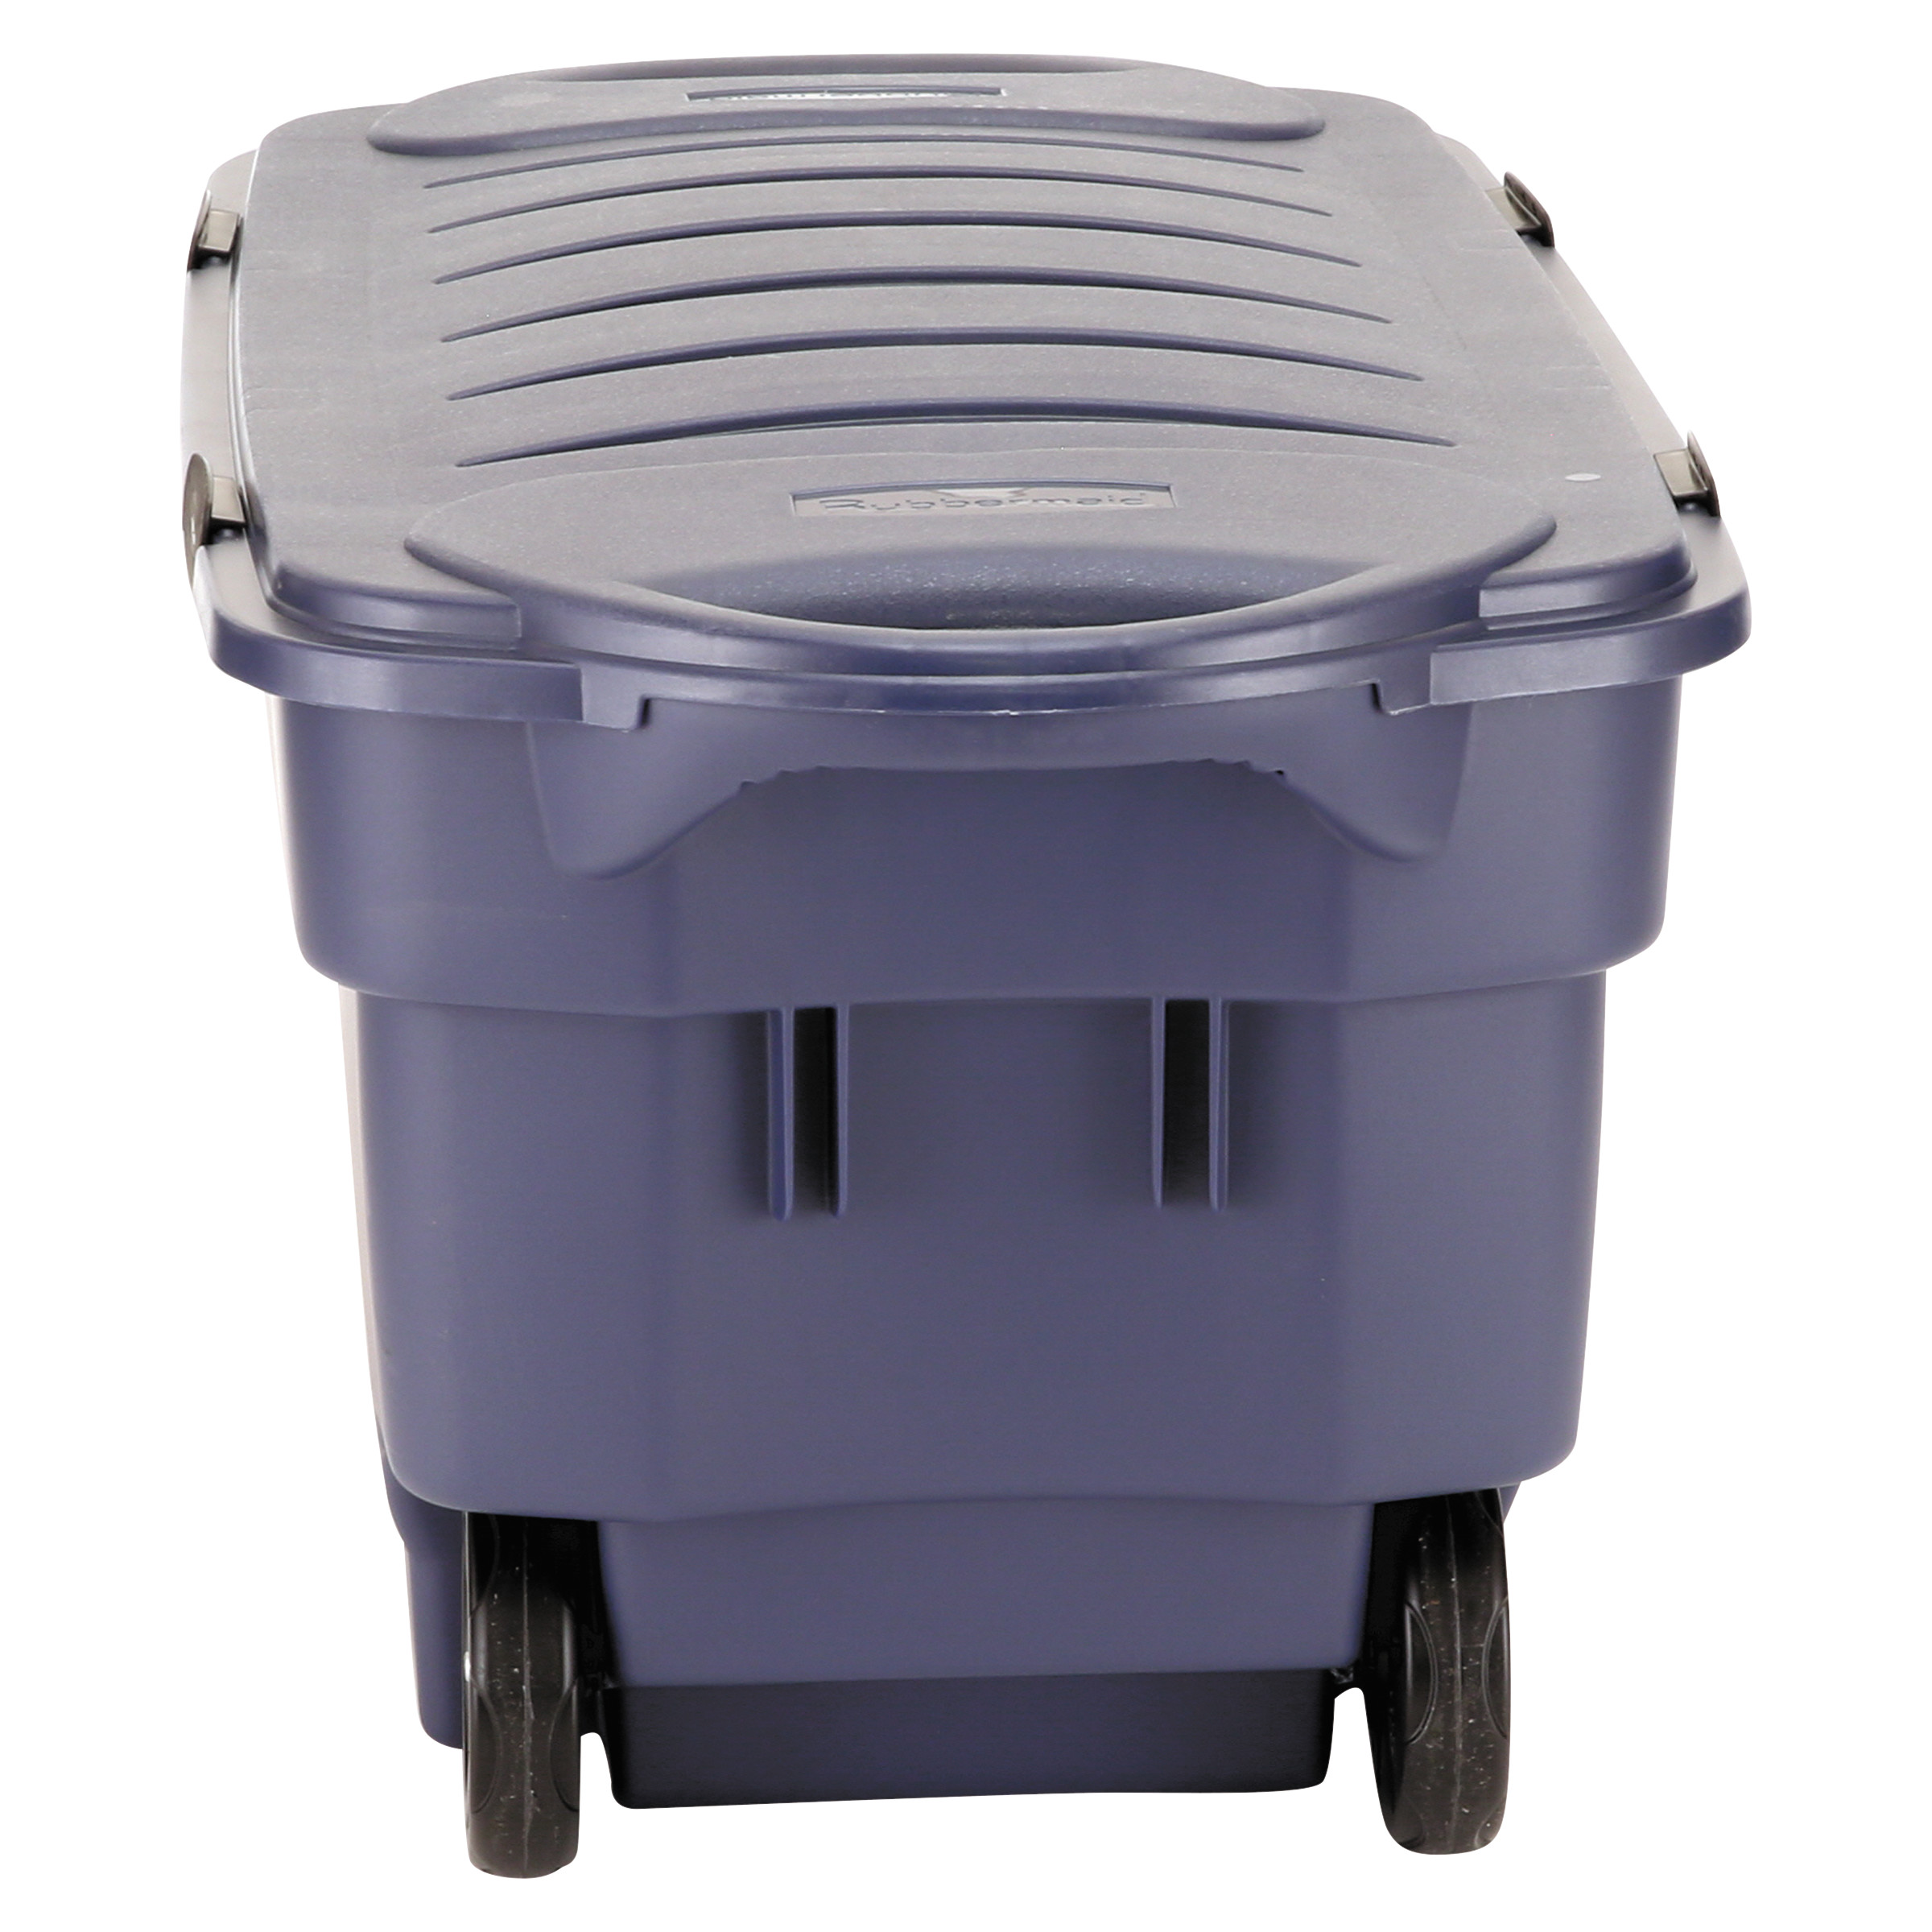 Beau Rubbermaid Roughneck Wheeled Storage Box, 45gal, Dark Indigo Metallic    Walmart.com